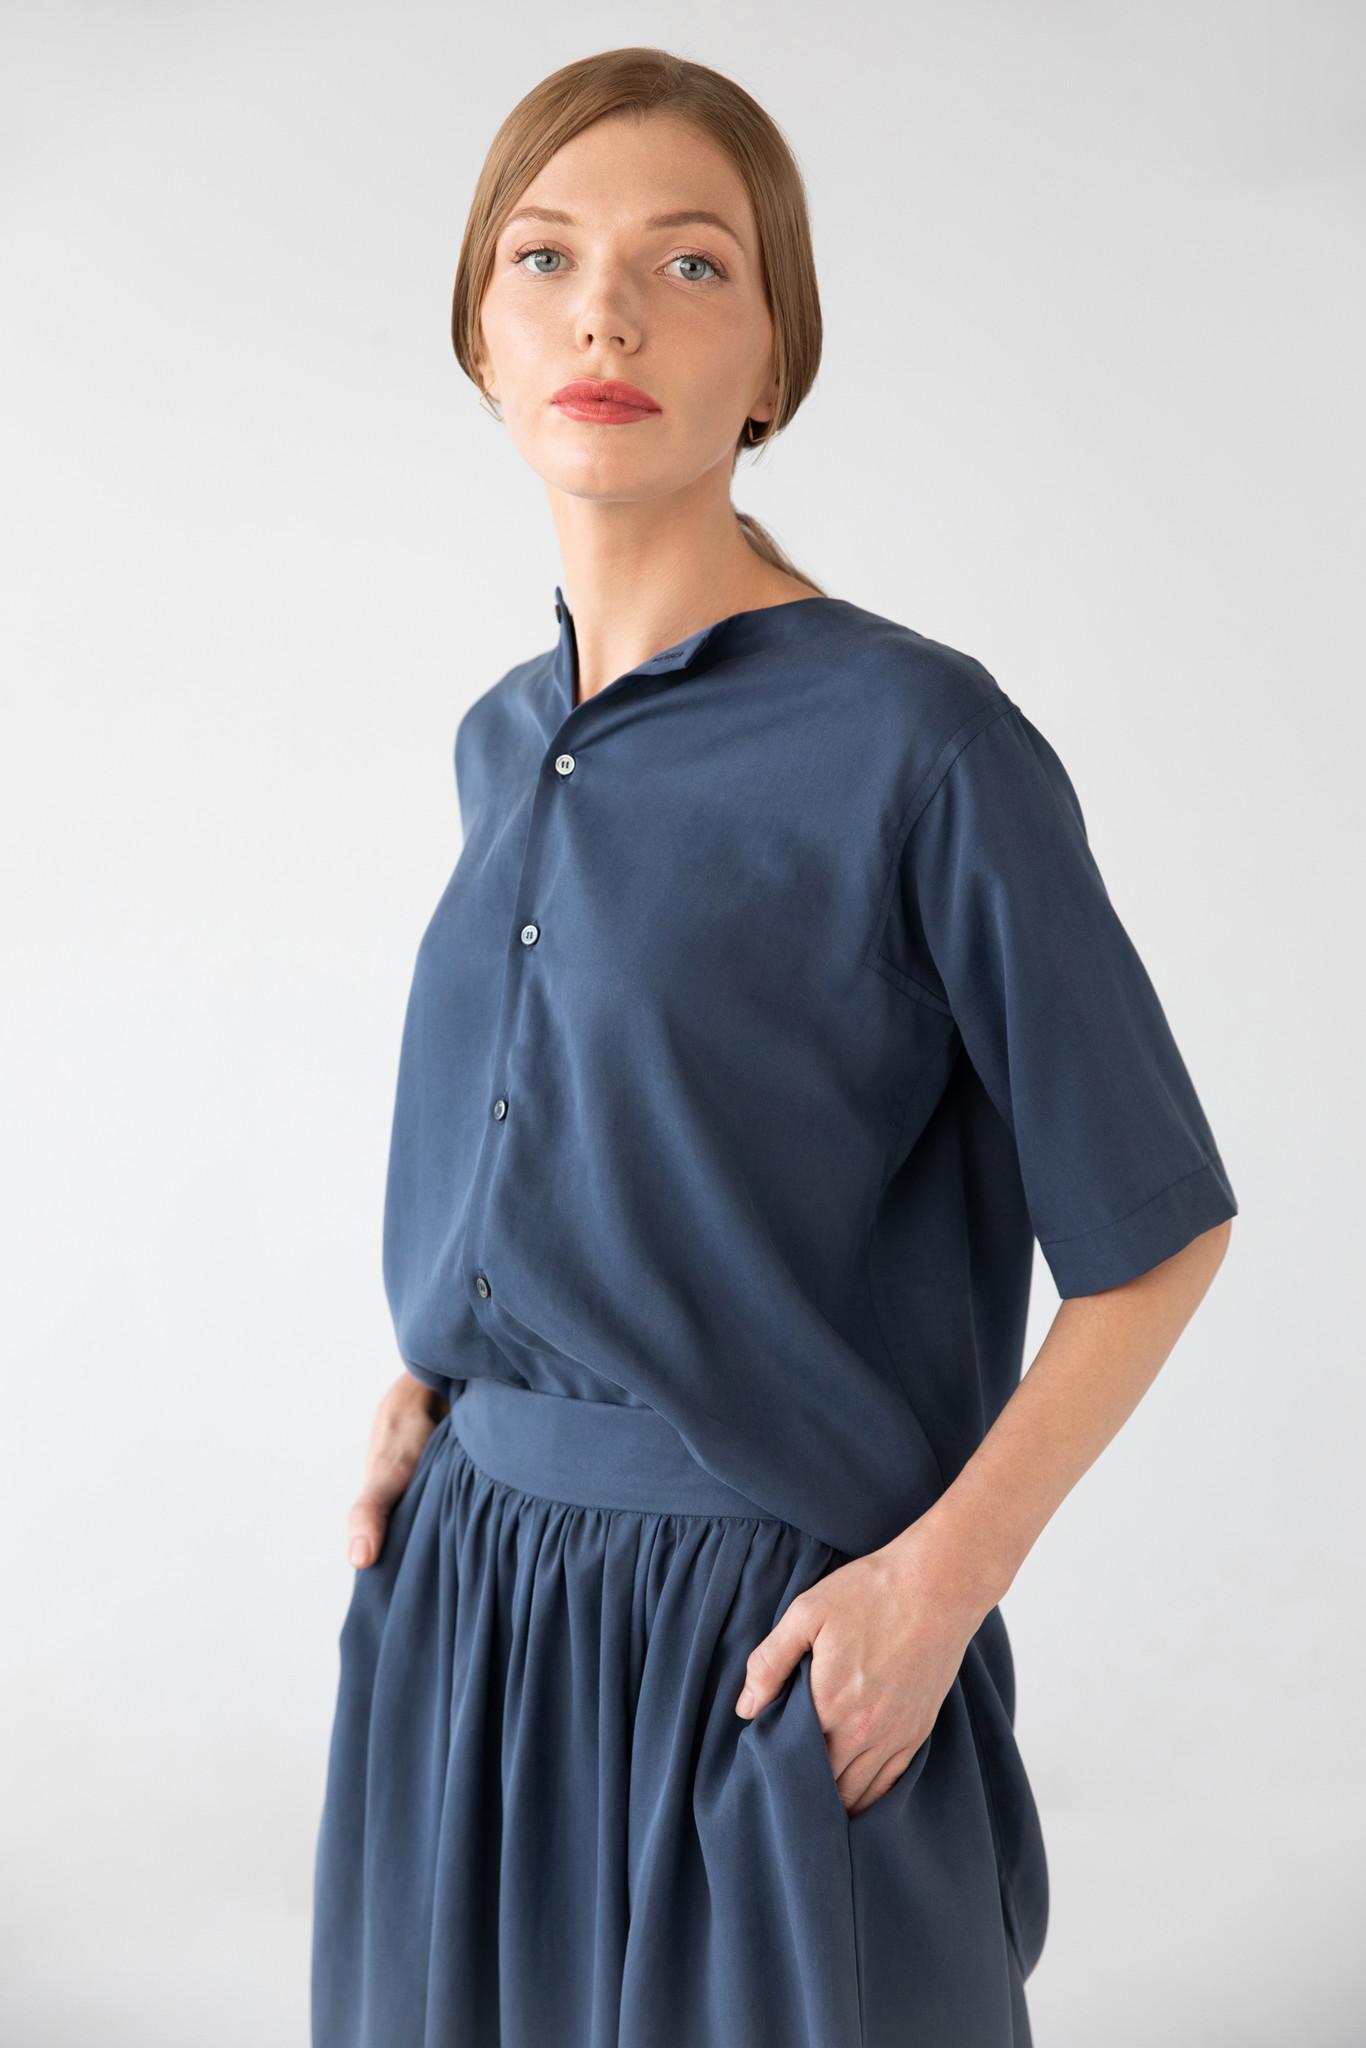 Bluse mit kurzem Arm aus Tencel - Blau-1